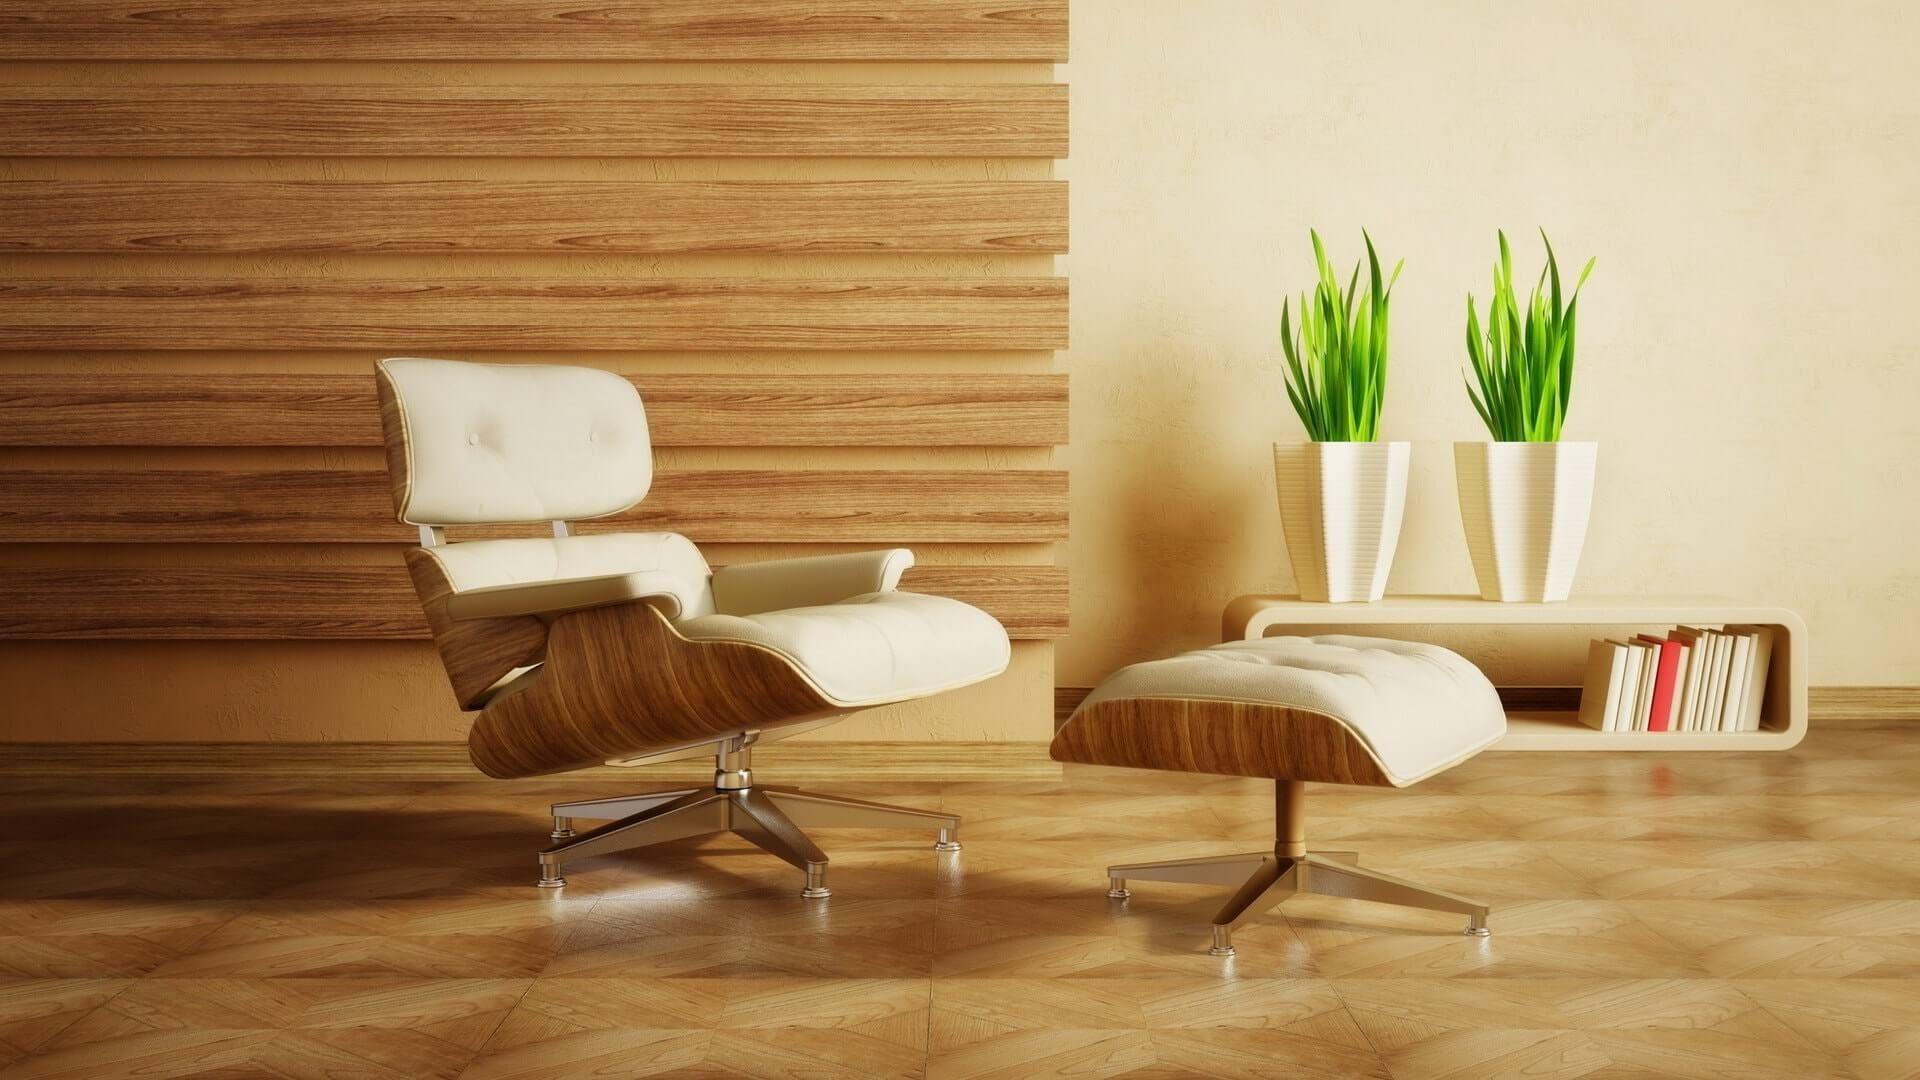 Furniture wallpaper photo hd